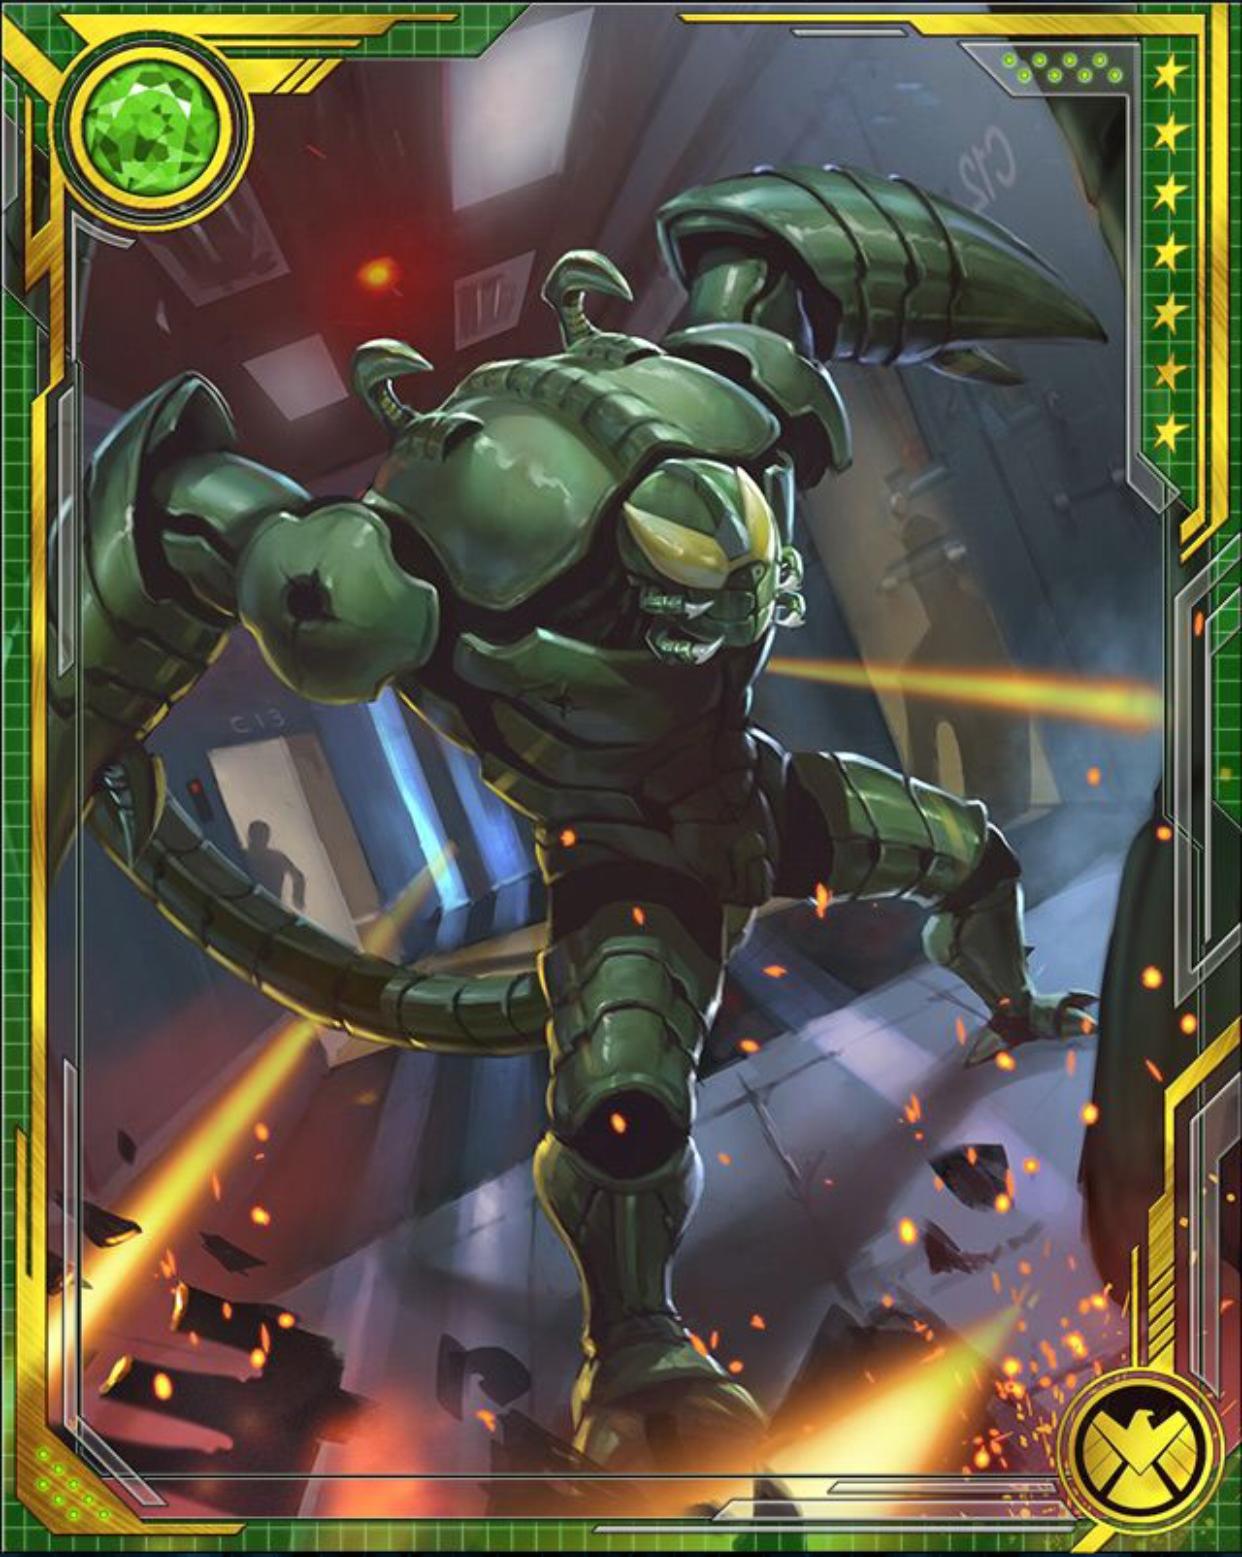 [Battlesuit] Scorpion | Marvel: War of Heroes Wiki ...